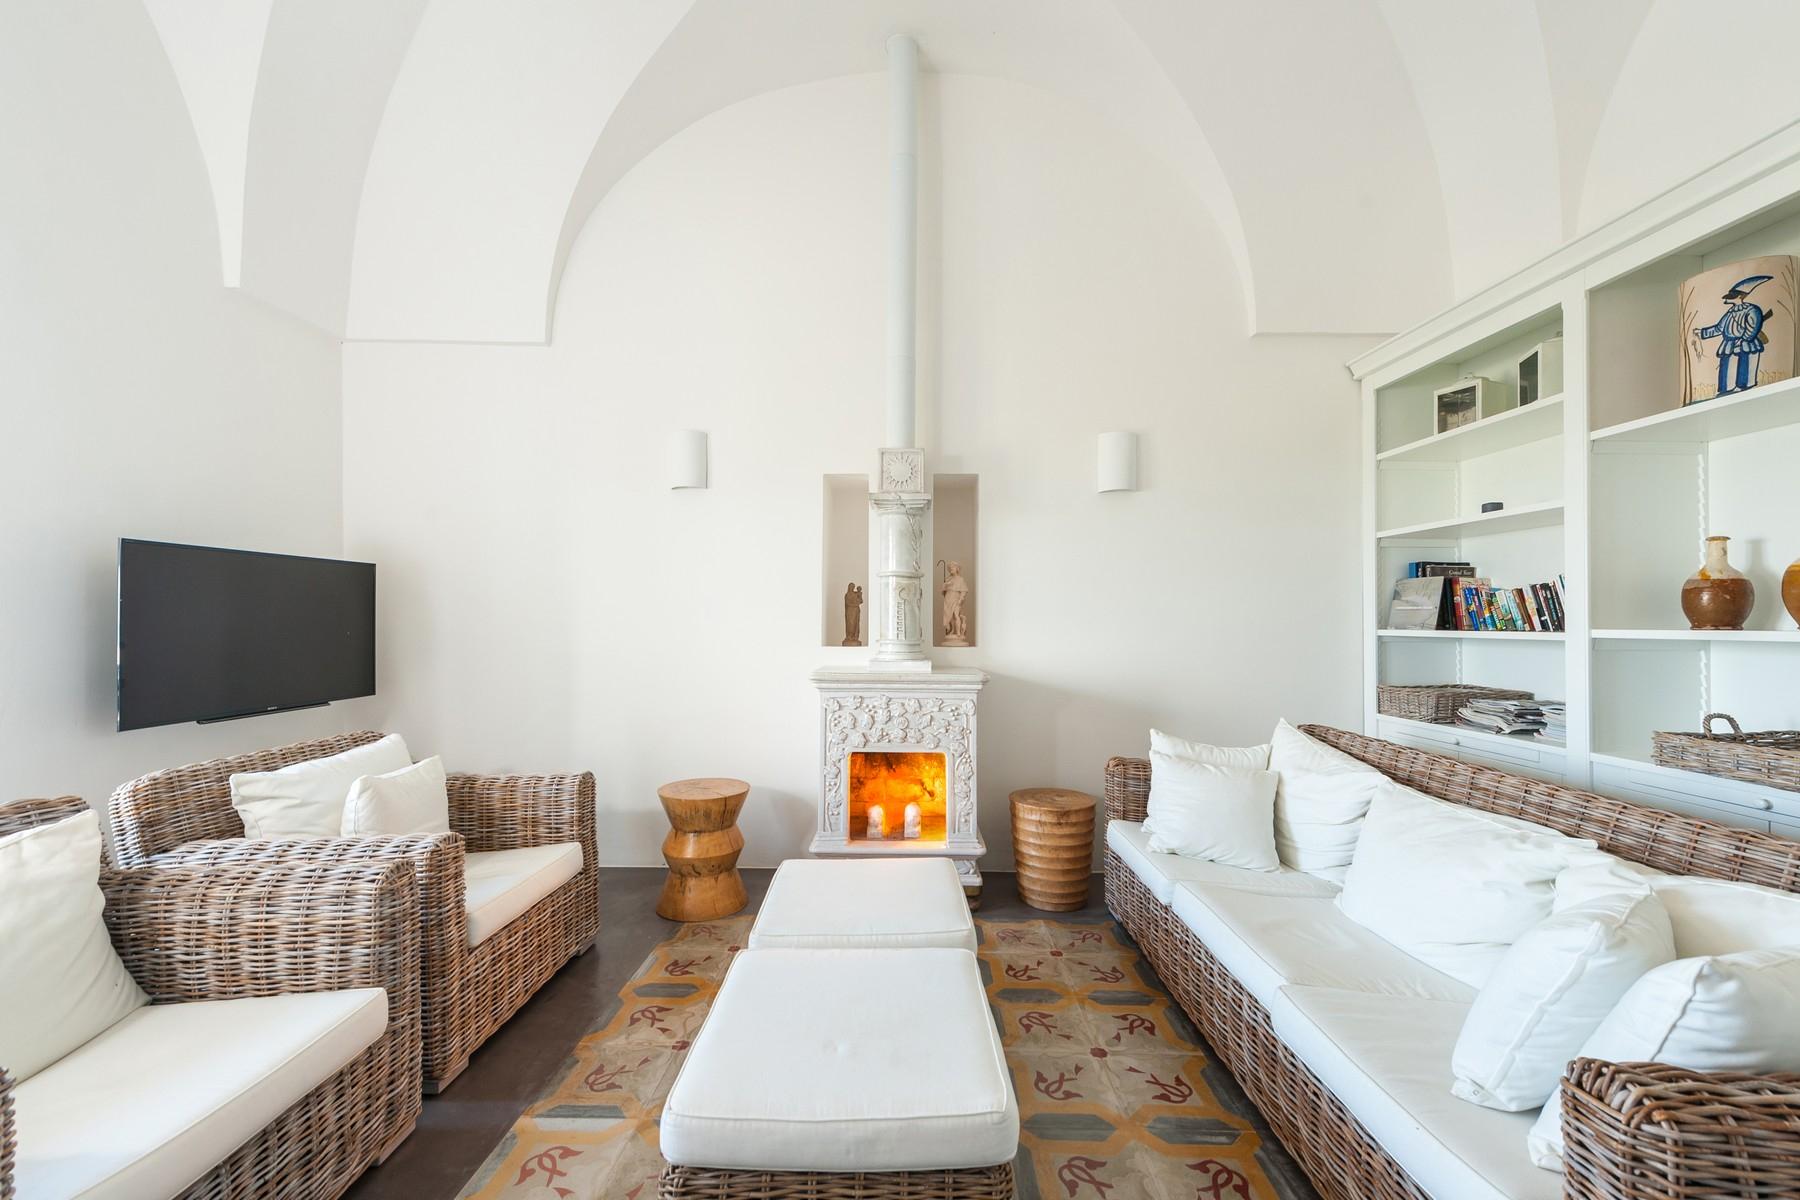 Appartamento in Vendita a Ostuni: 5 locali, 265 mq - Foto 2